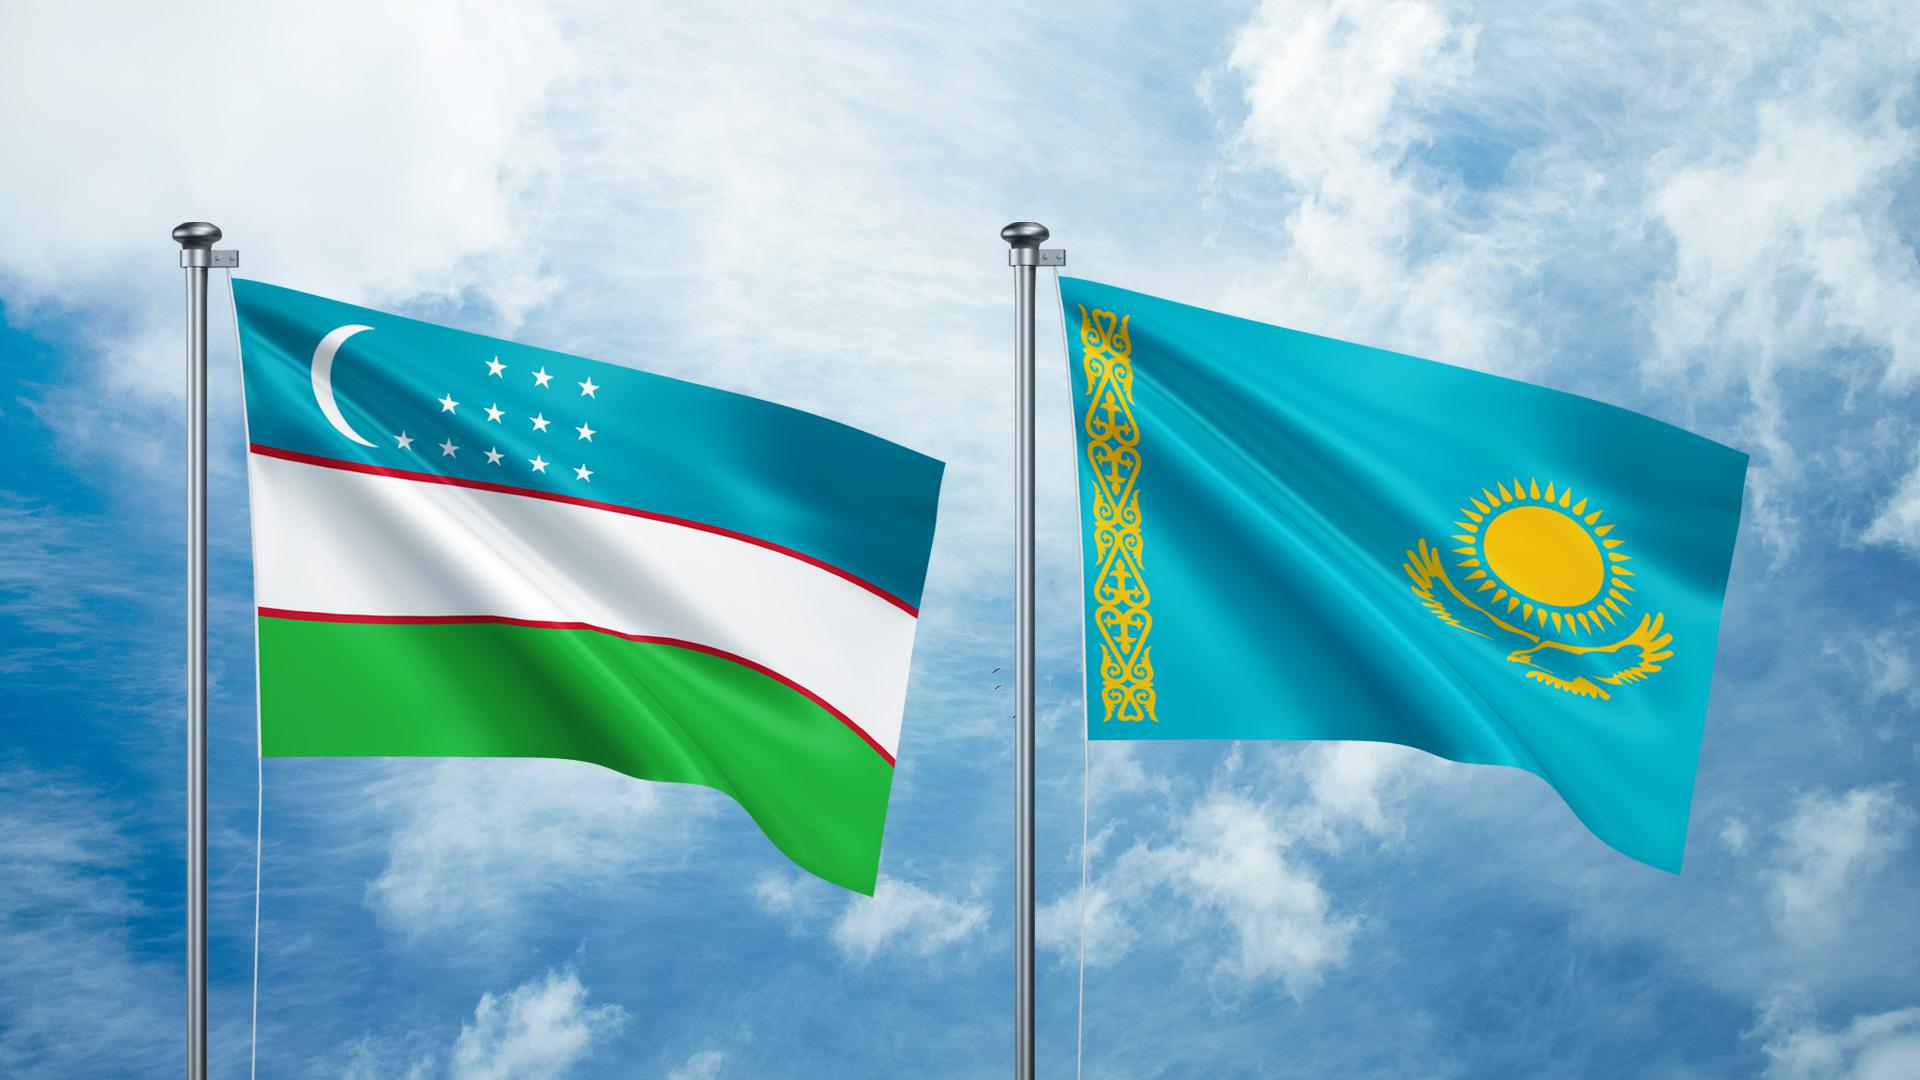 Uzbekistan and Kazakhstan finalizing negotiations on launching Silk Road Visa